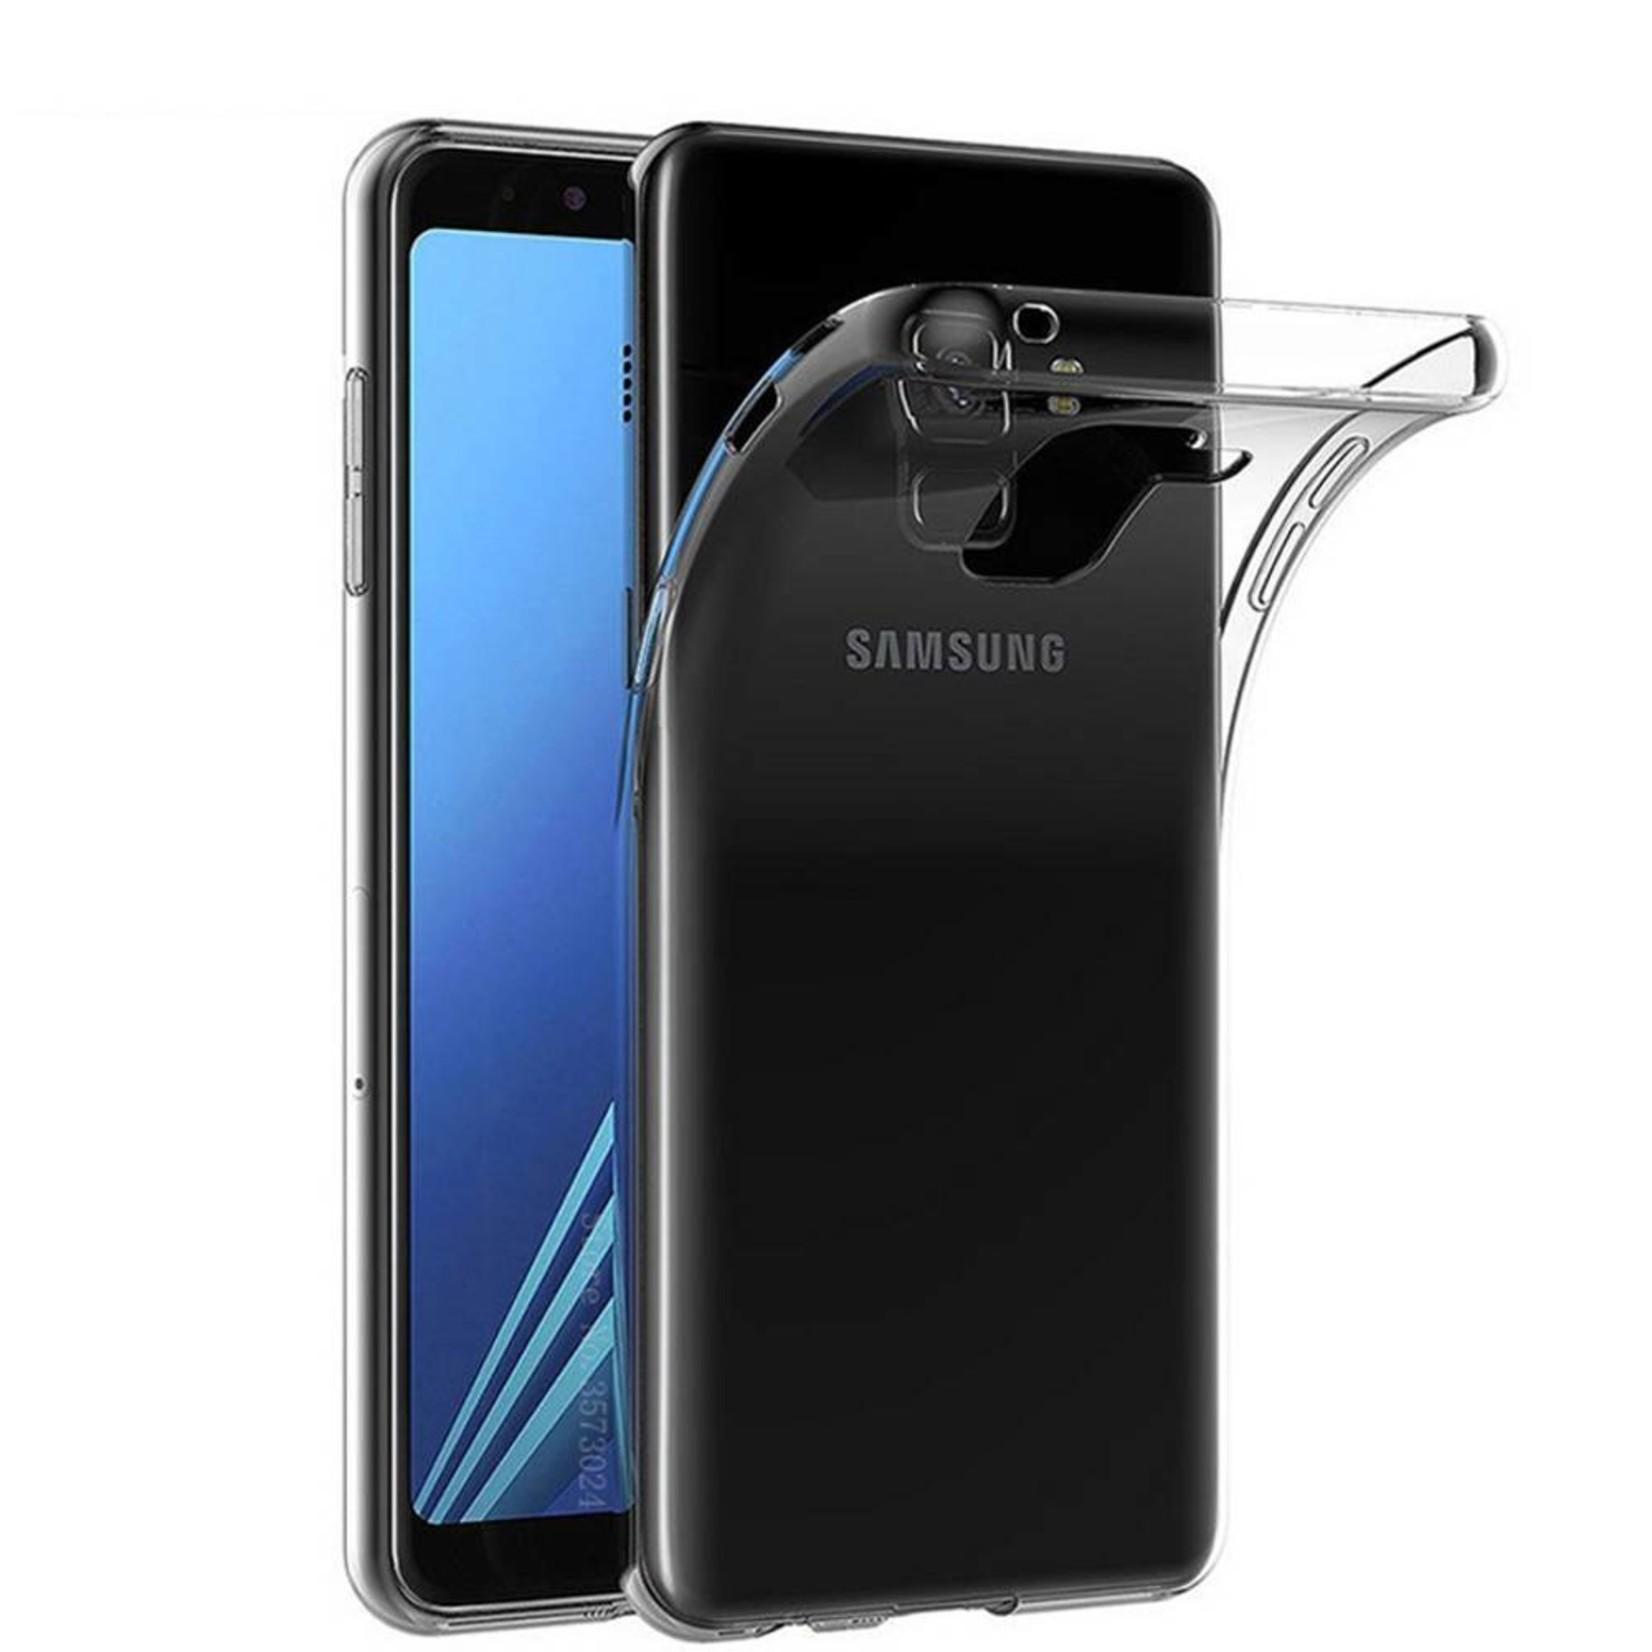 Colorfone Hoesje CoolSkin3T voor Samsung J8 Transparant Wit